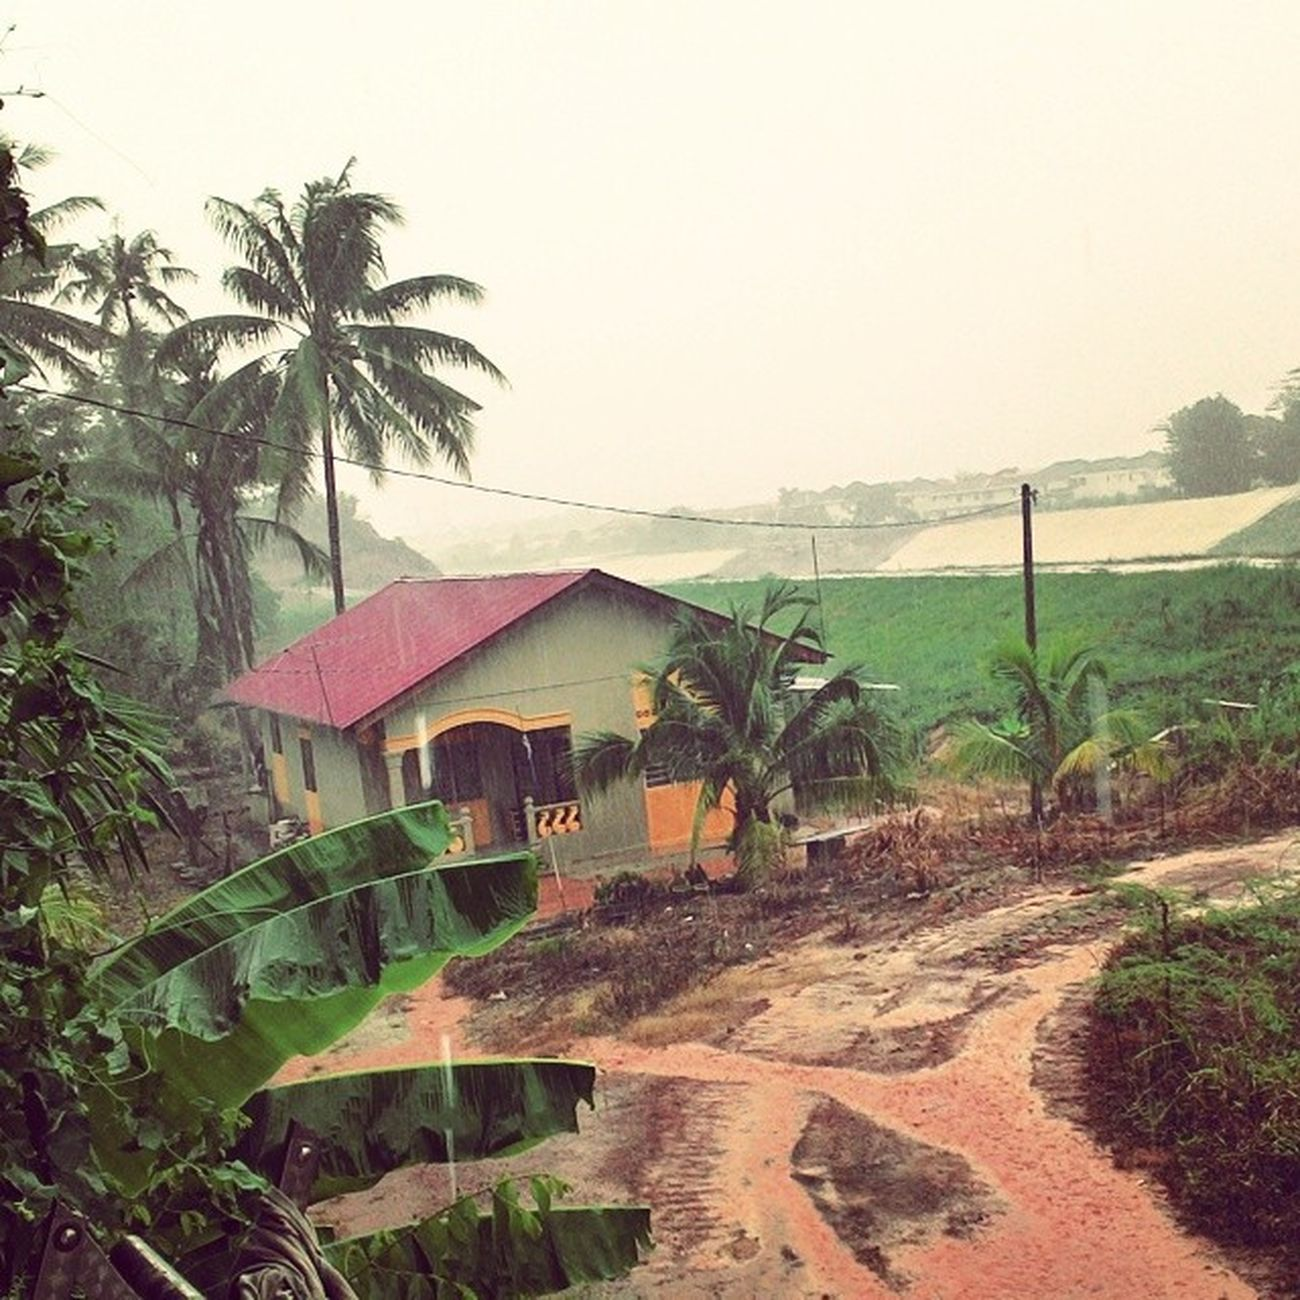 Hujanlebat Anginribut Segamat Rumahtepisungai praktikal snap2 akuxberapasukasangathashtag waaah amboi